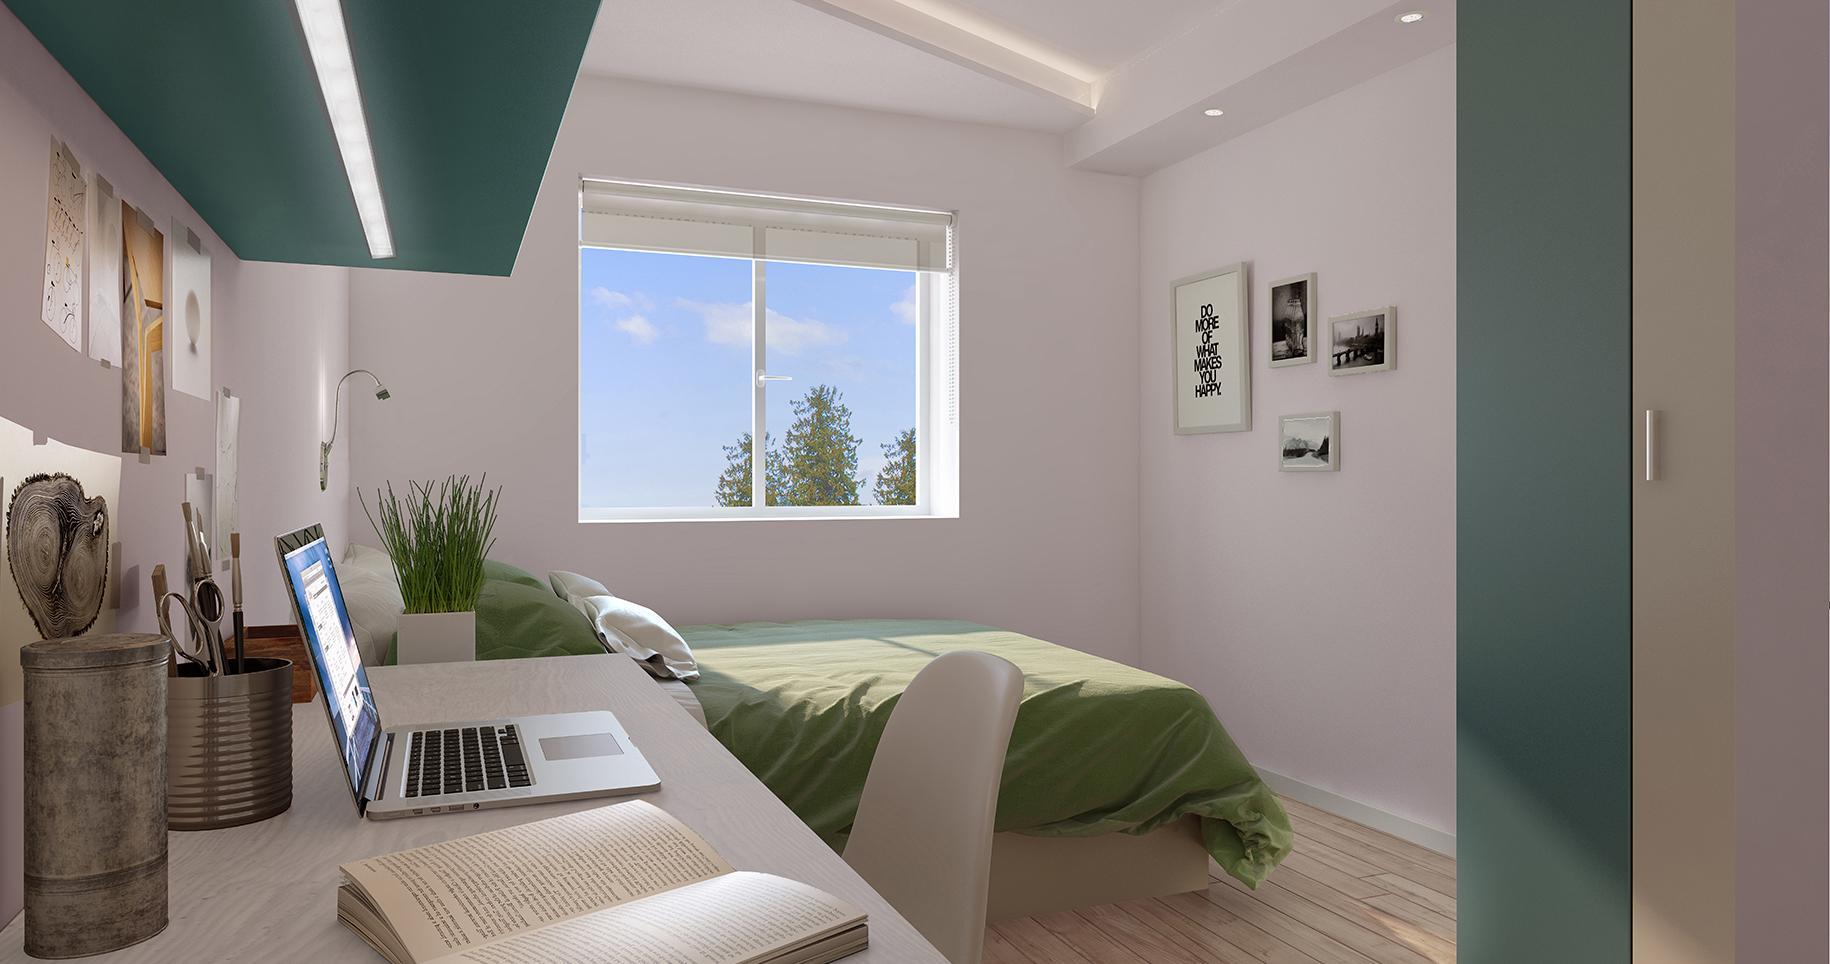 Podium-Egham-Studio-Bedroom 3-Unilodger